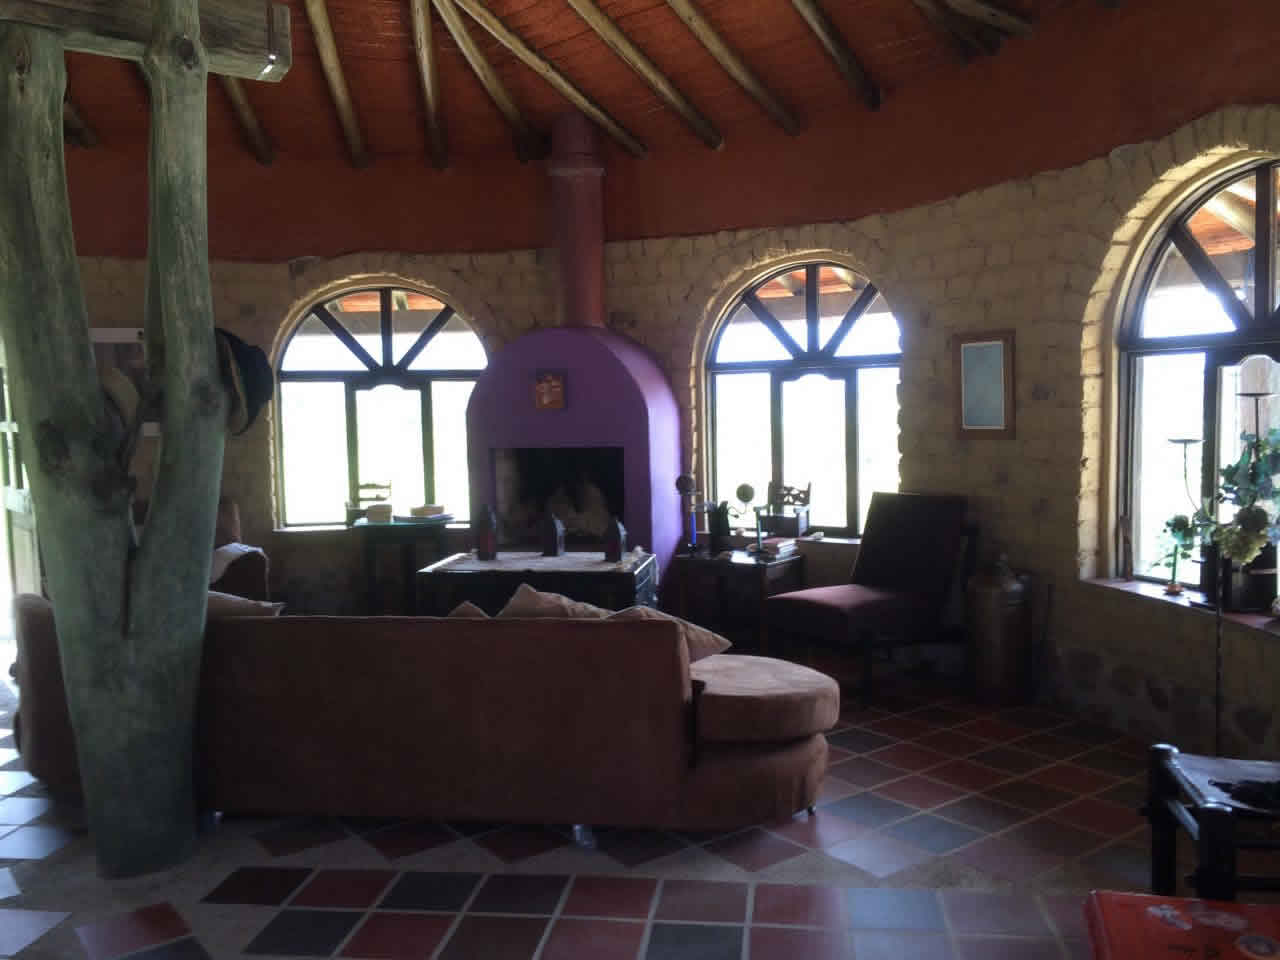 Alquiler casa Jishana Villa de Leyva - Sala